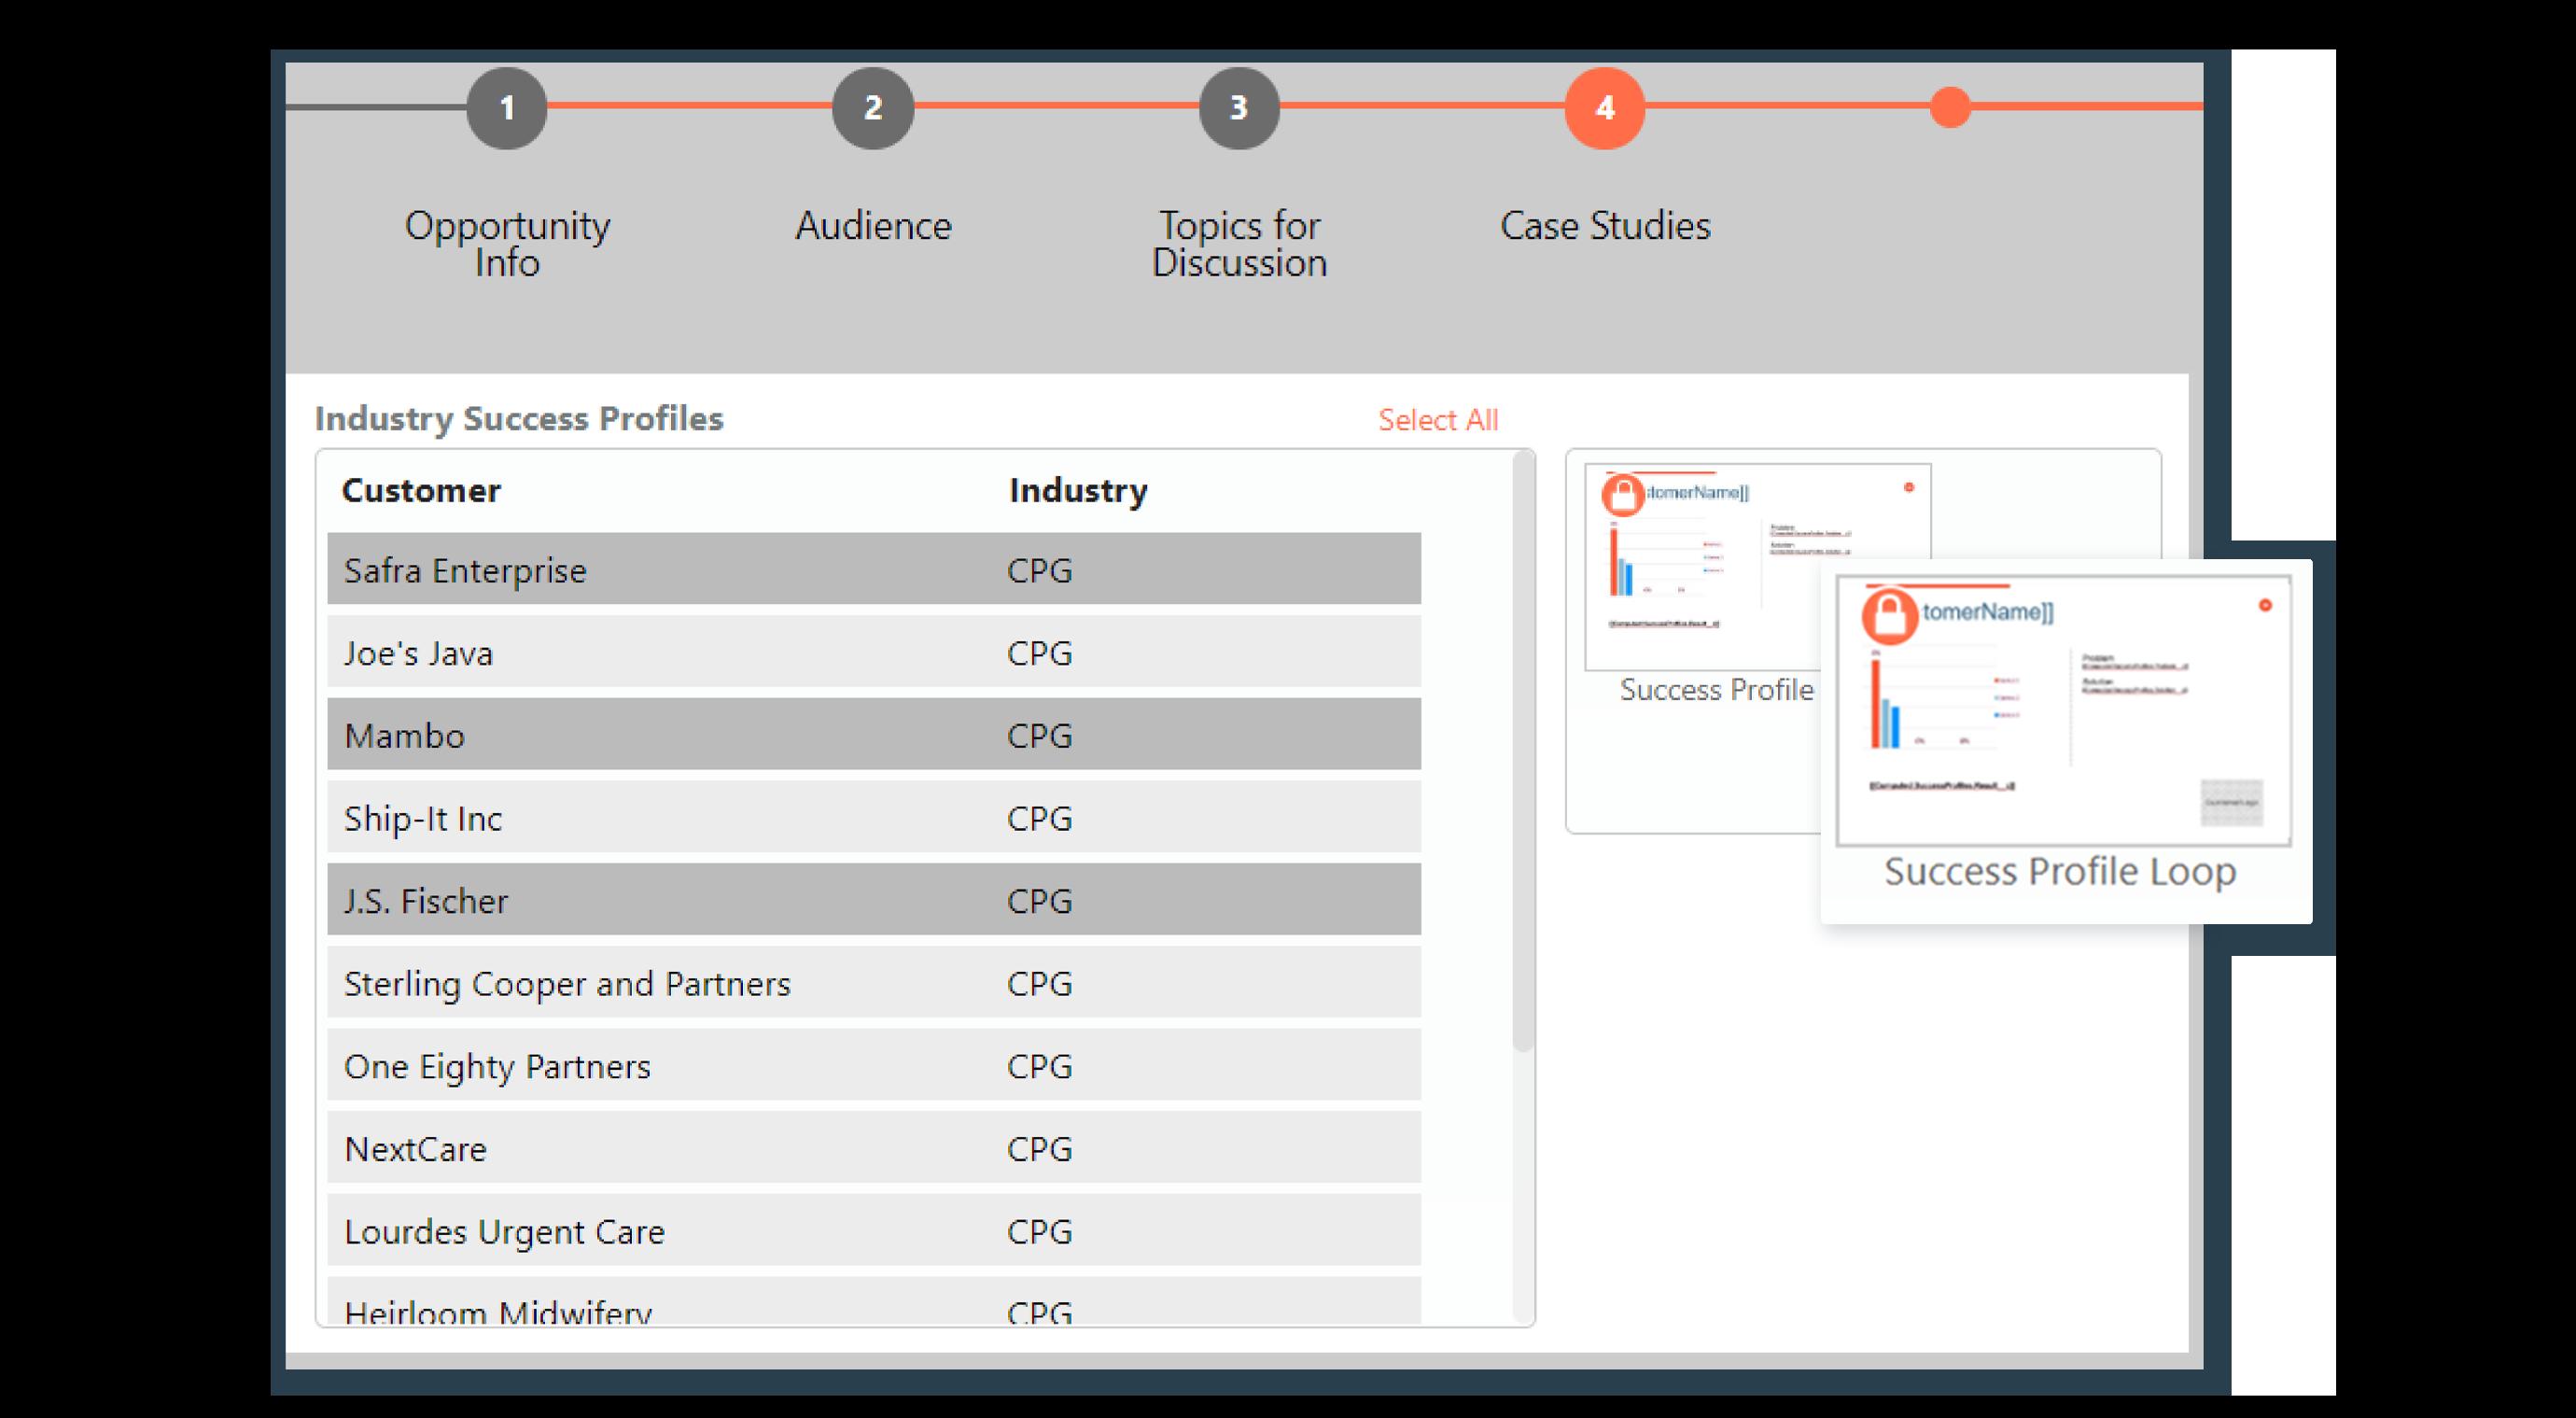 Product_SalesTeams_Personalization_Self-Service-Customization